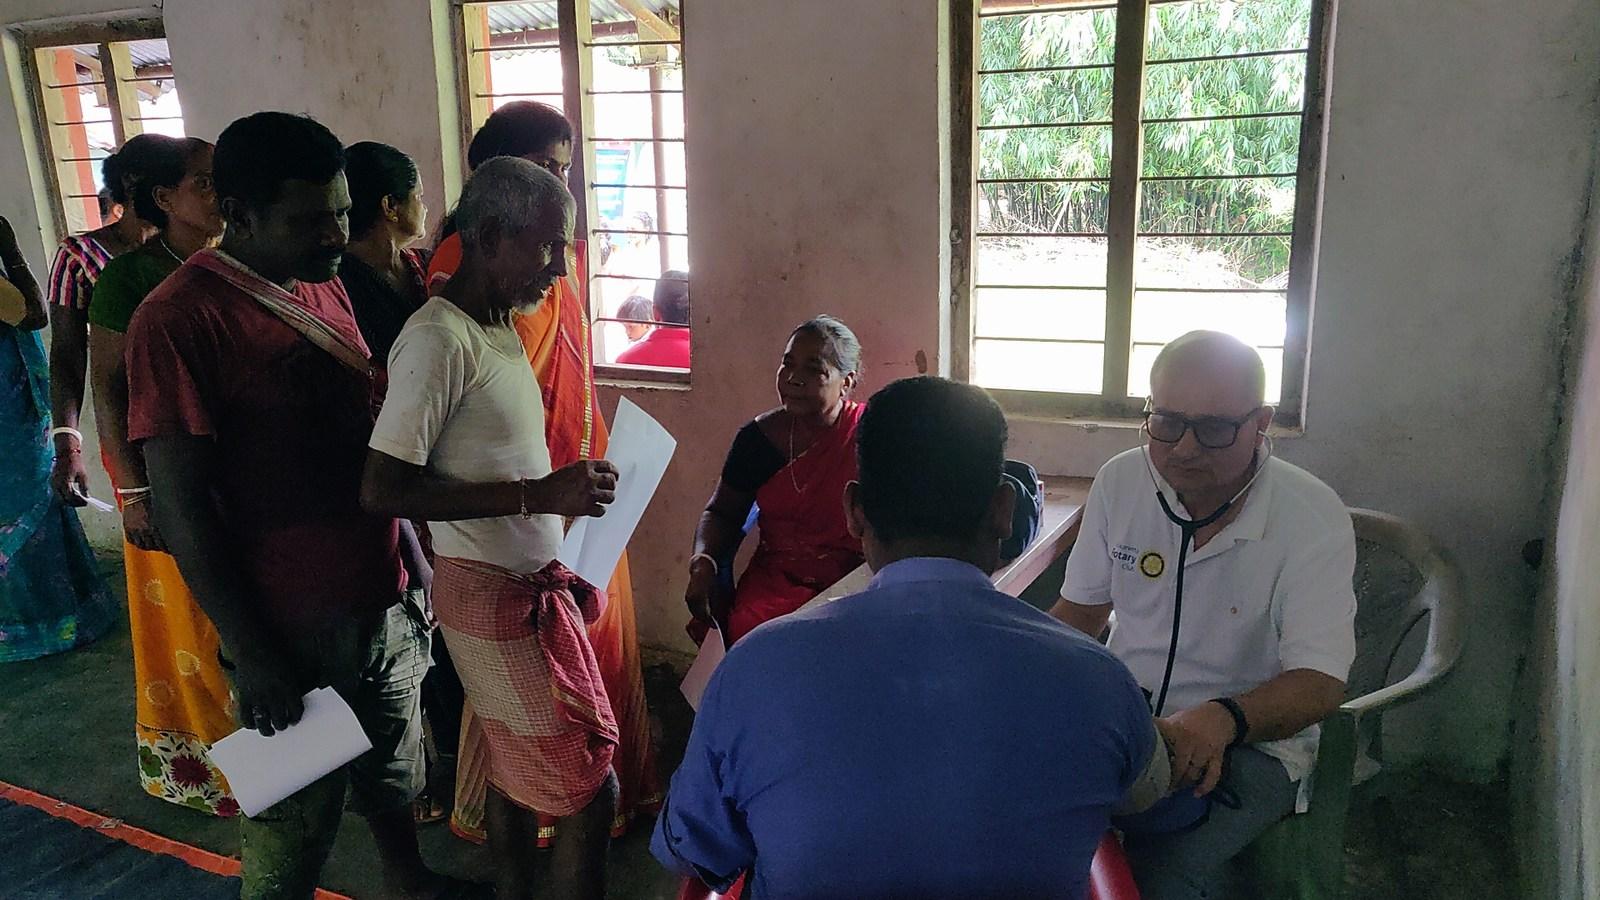 Free-Health-Camp-Eye-Screening-at-Gwala-Basti-Mechinagar-15-Jhapa-Nepal-Rotary-Club-of-Kakarvitta-30